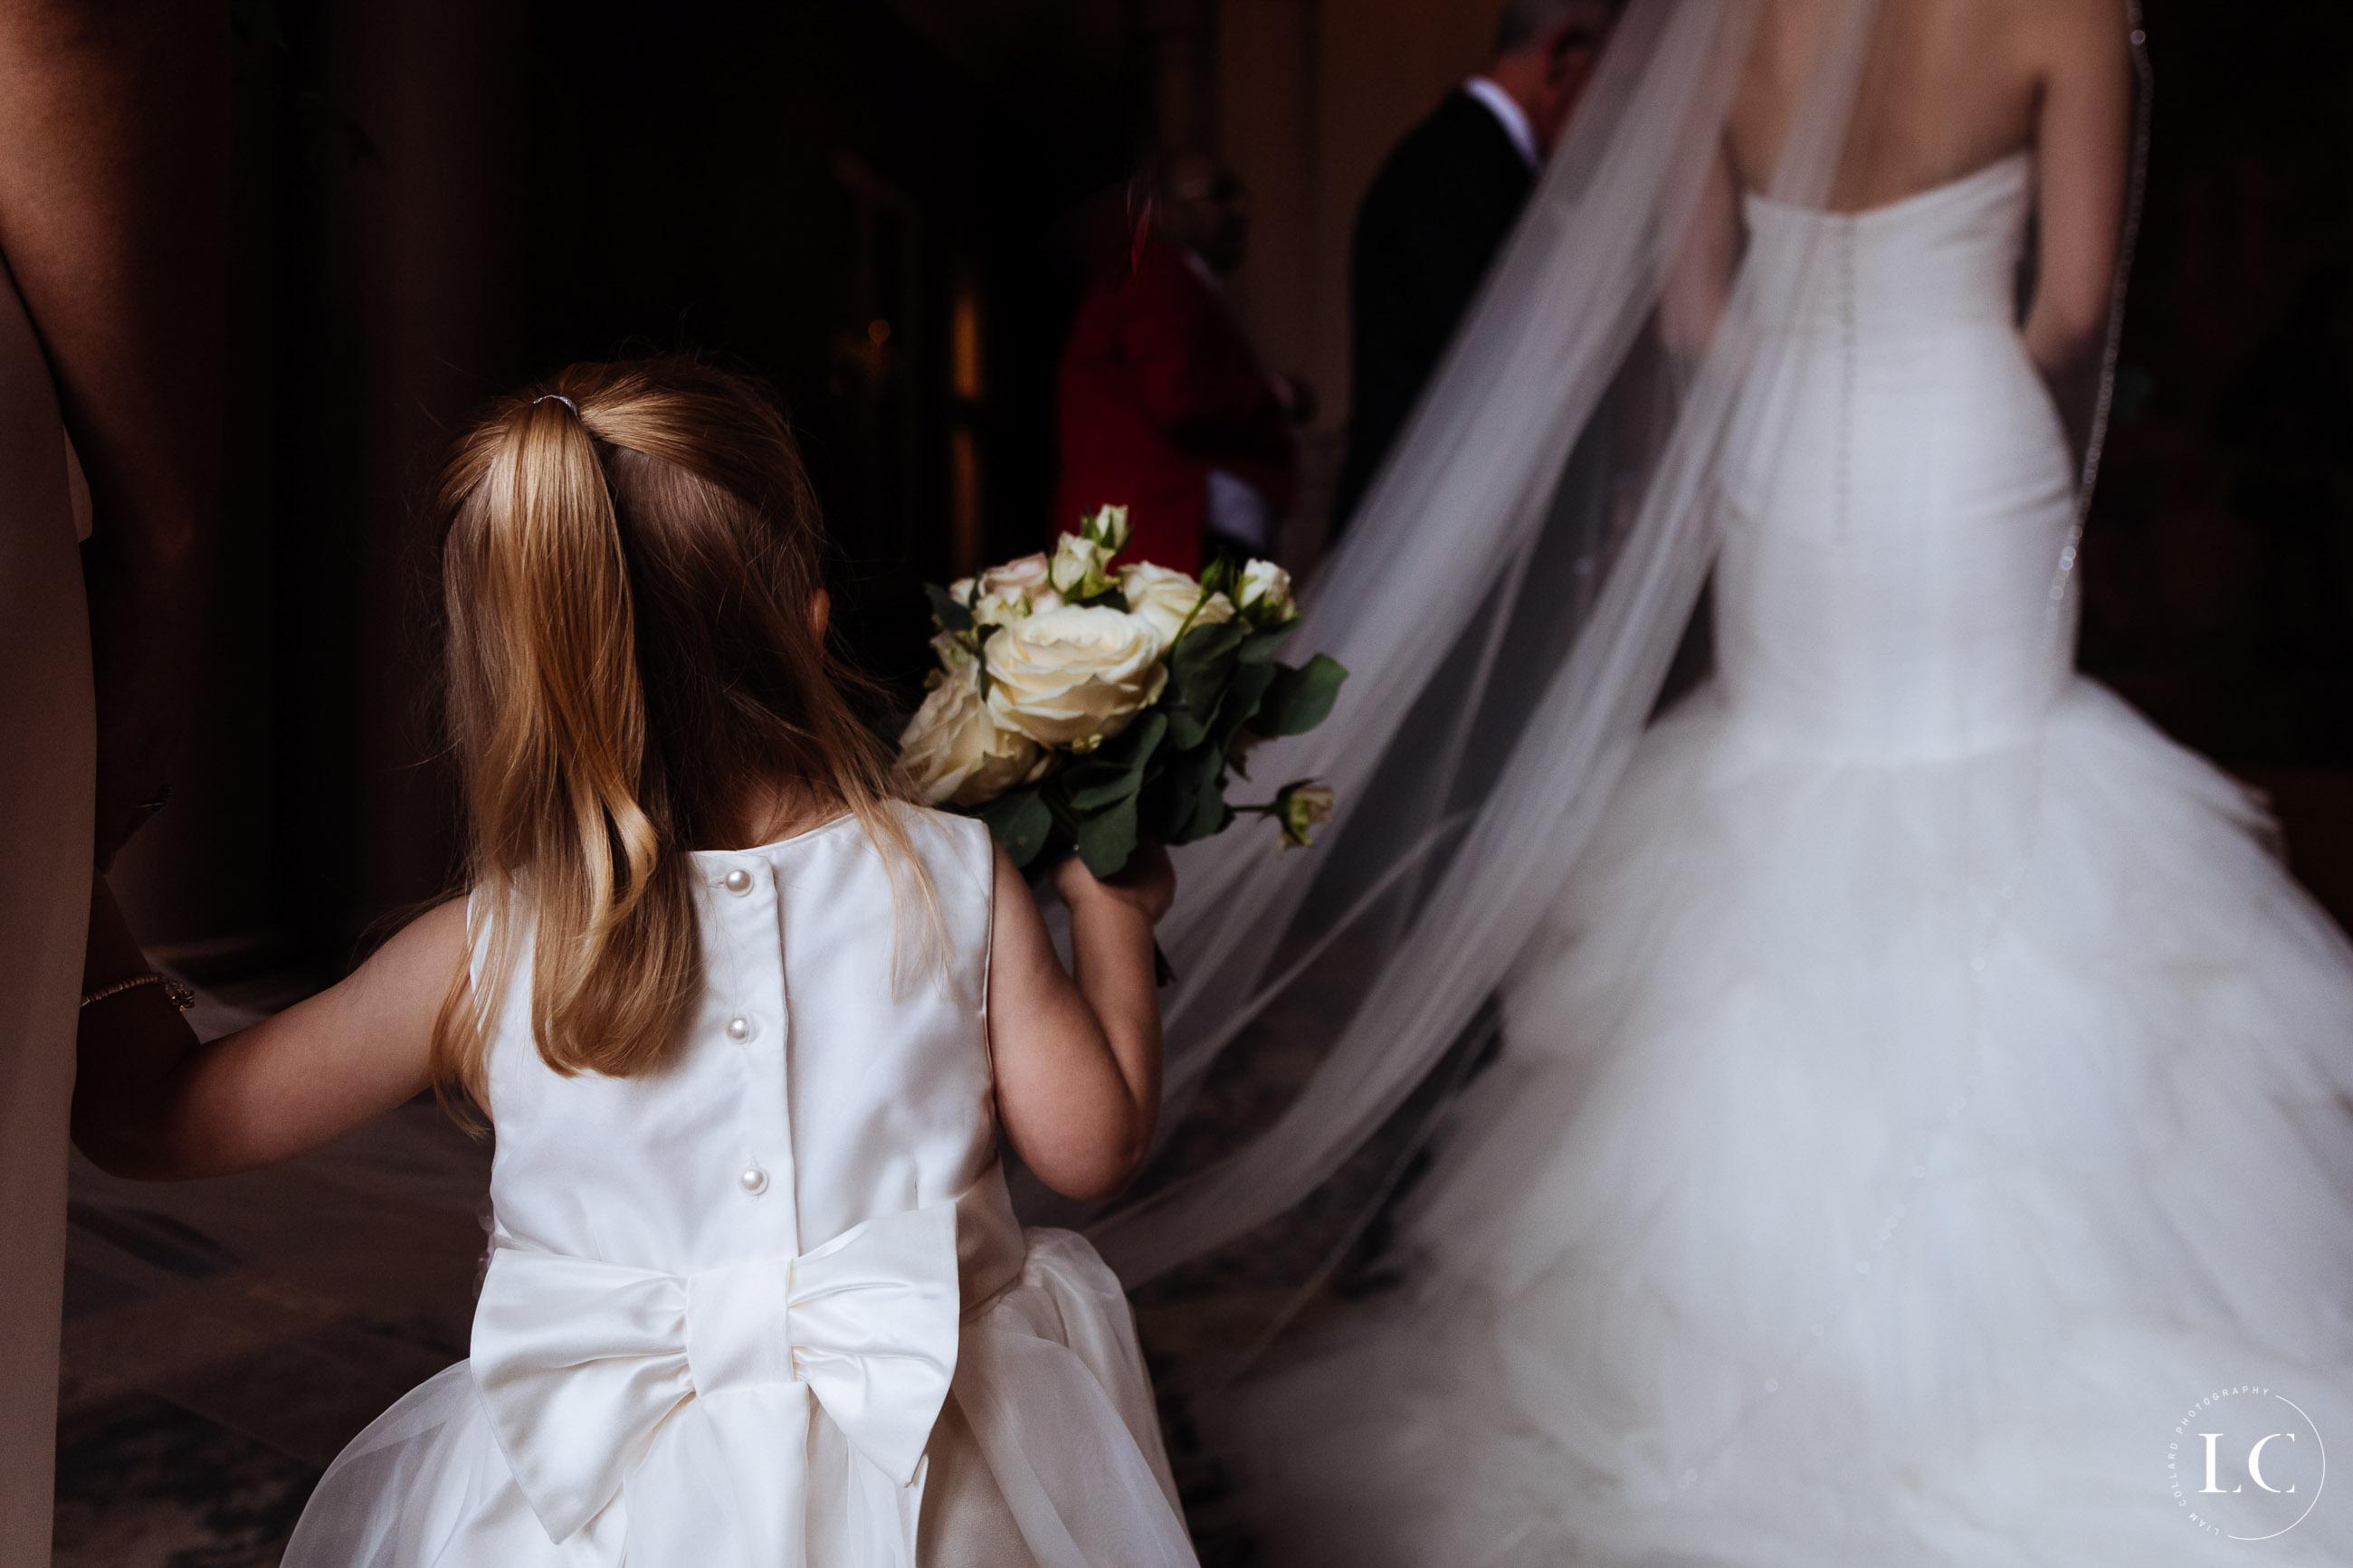 A child touching the wedding dress